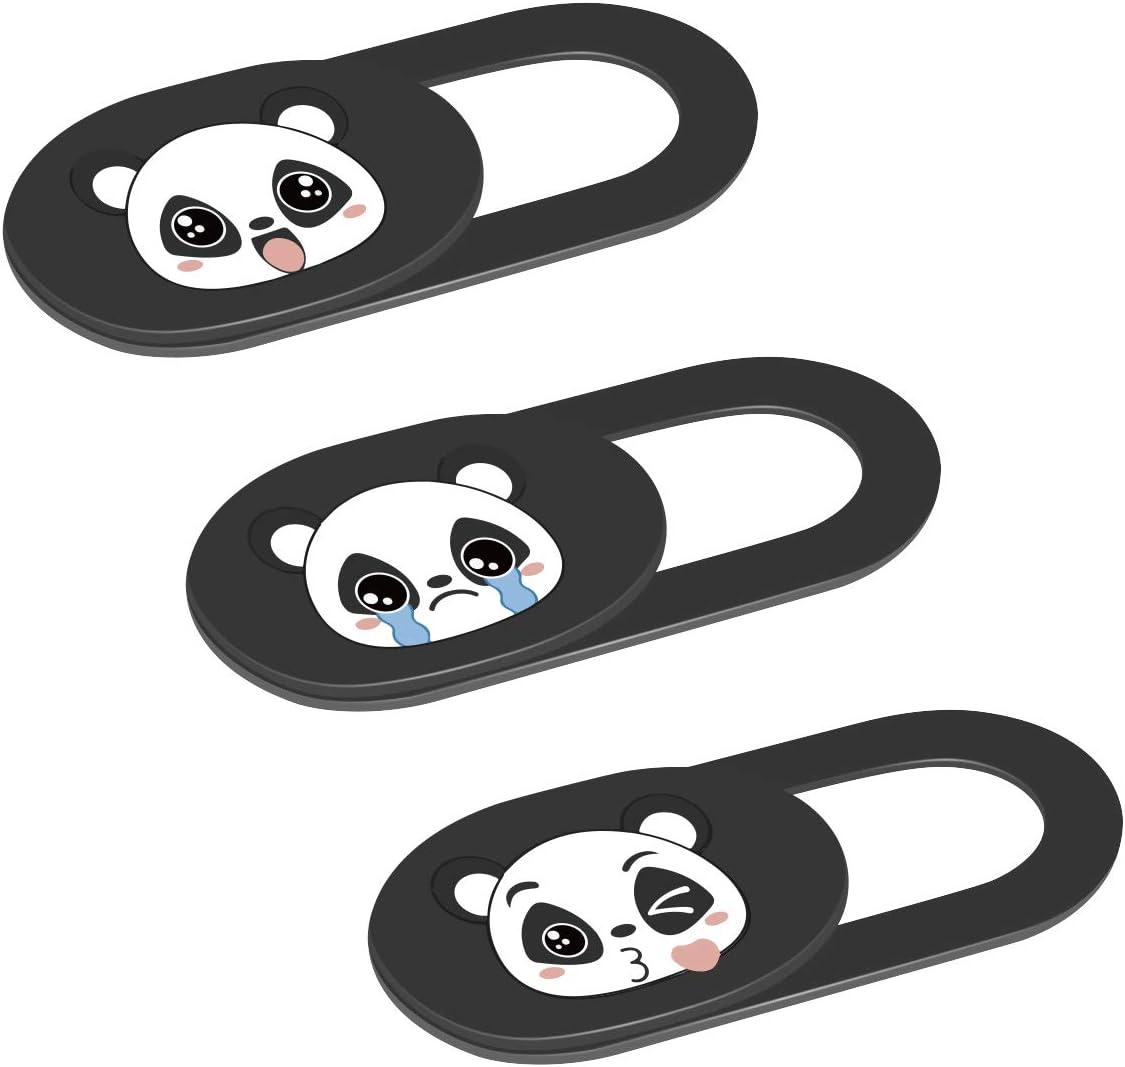 Webcam Camera Cover Slide 0.02-Inch Ultra-Thin Cute Pattern Camera Cover for MacBook, iMac, Laptop, PC, iPad, iPhone, Smartphone, Protect Your Visual Privacy (Cute Panda-Black)